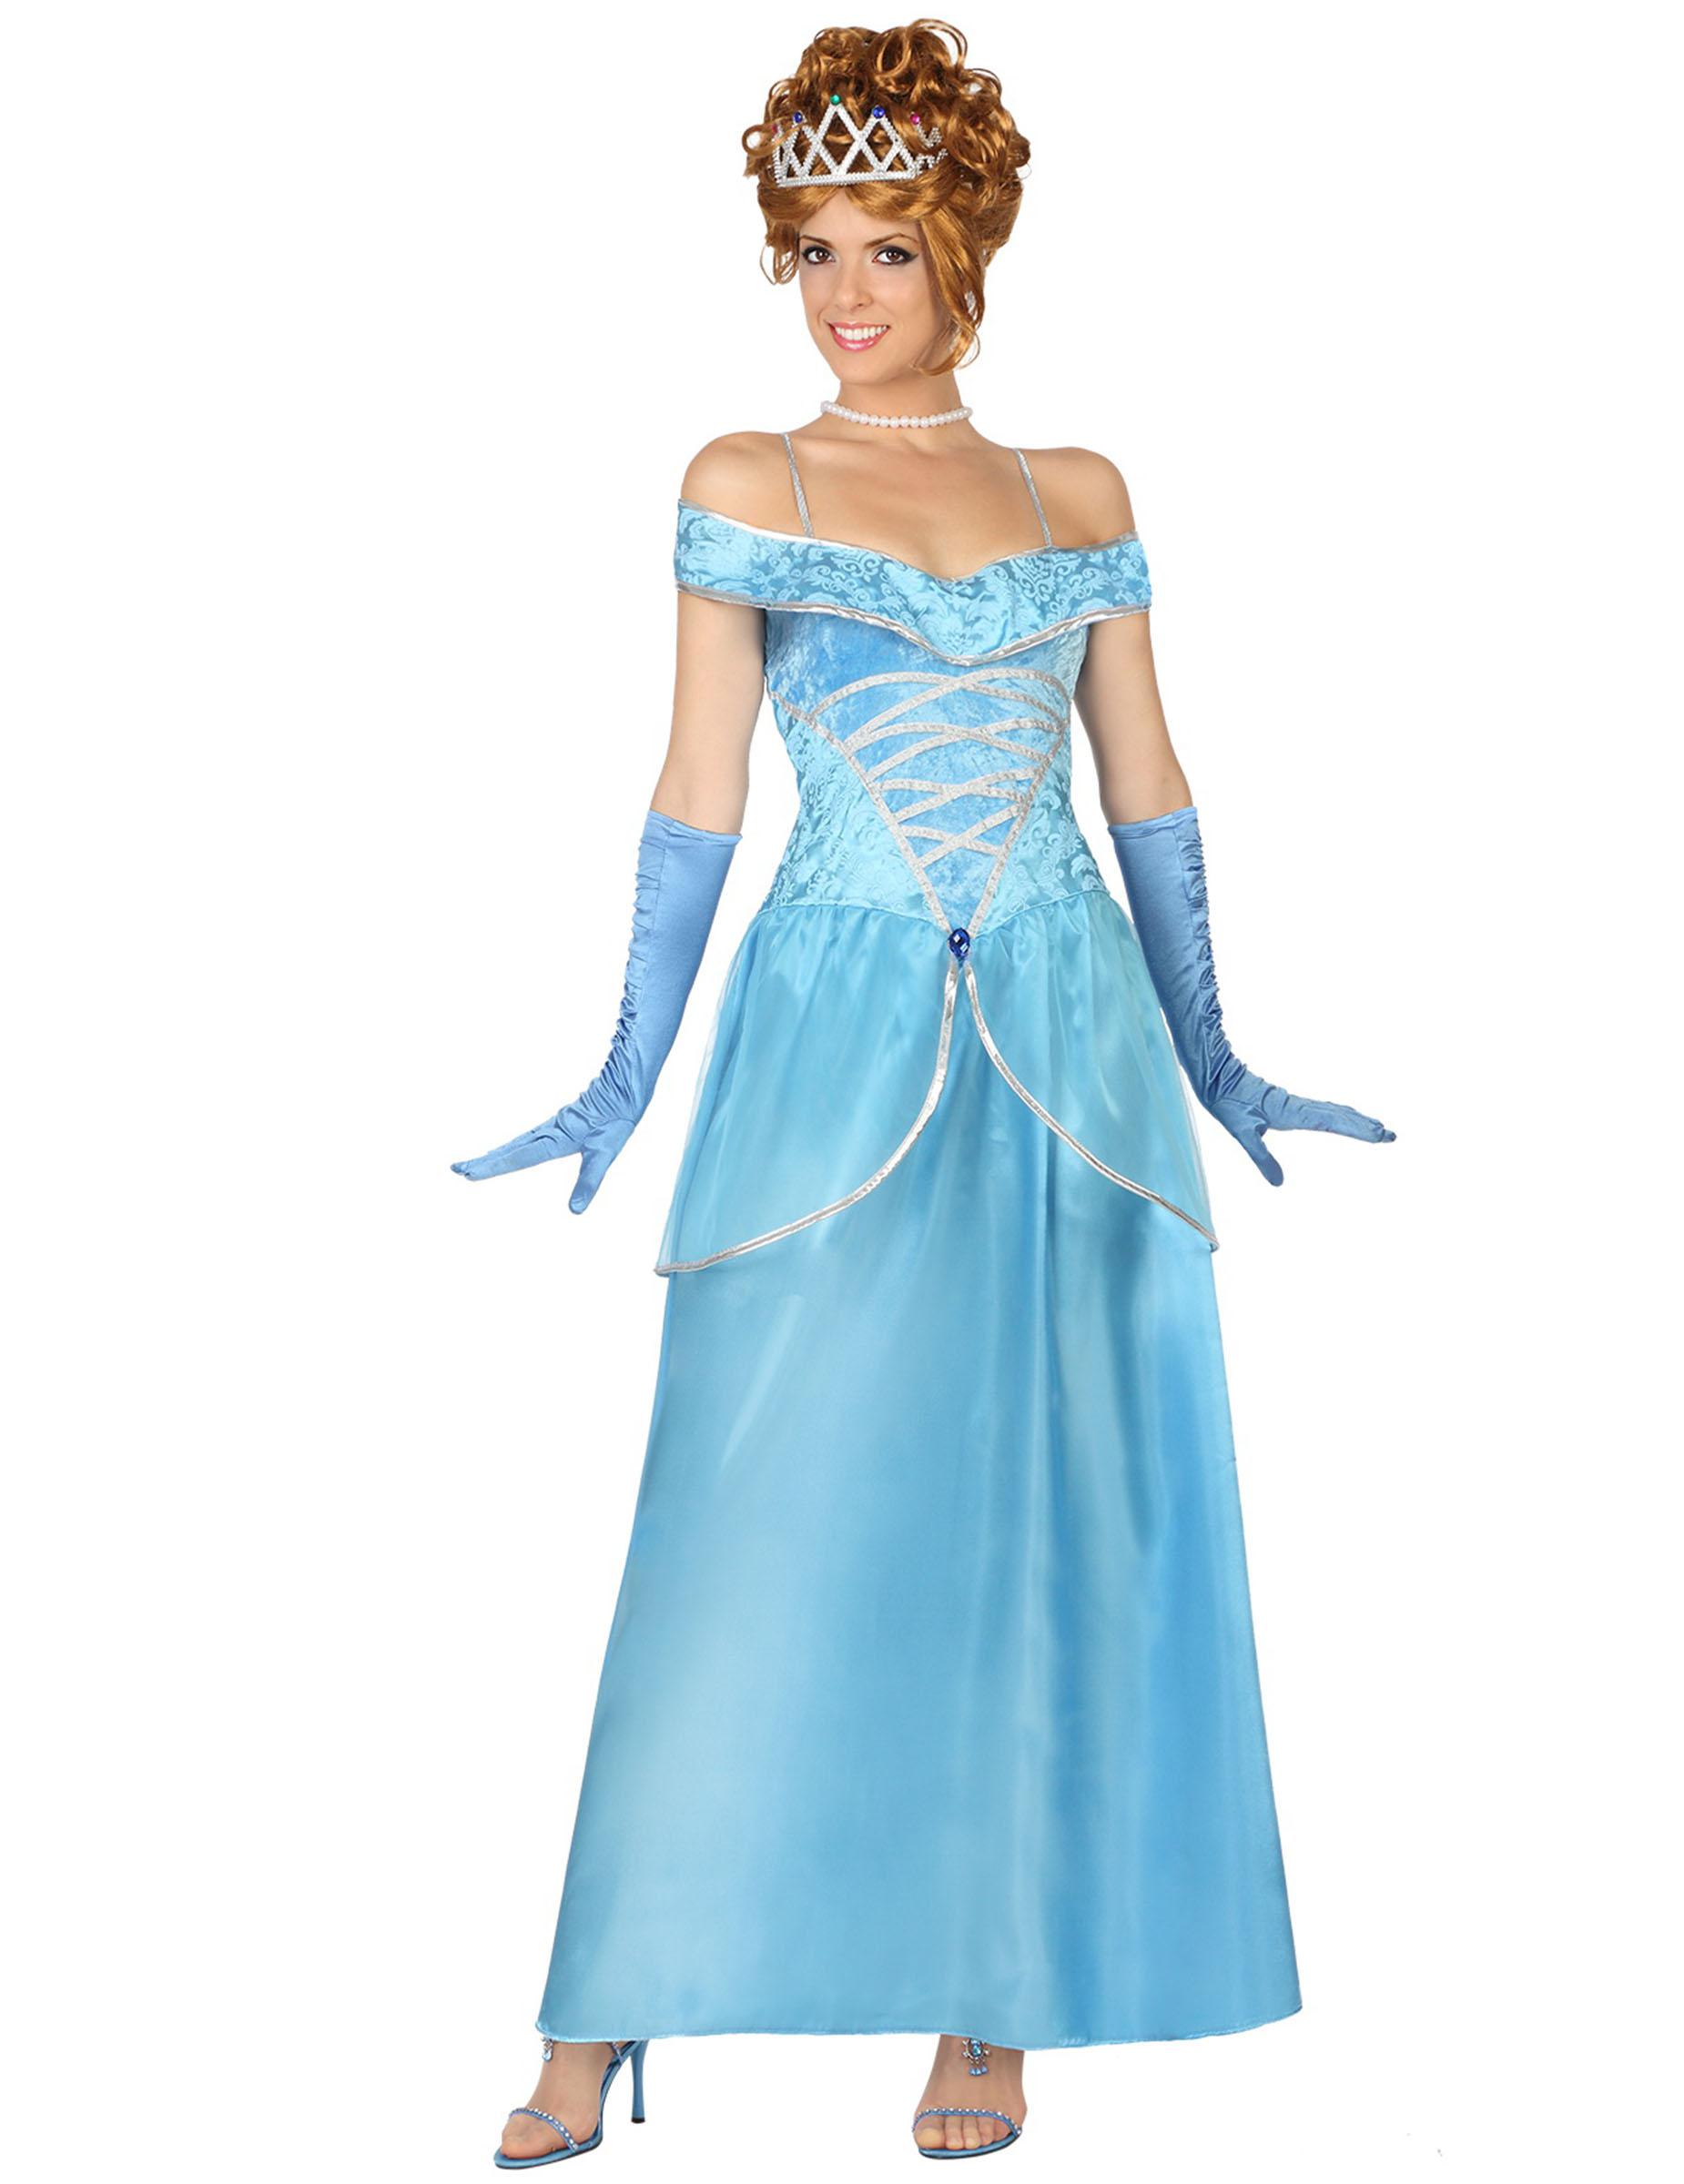 Snow White Disney Wedding Dress